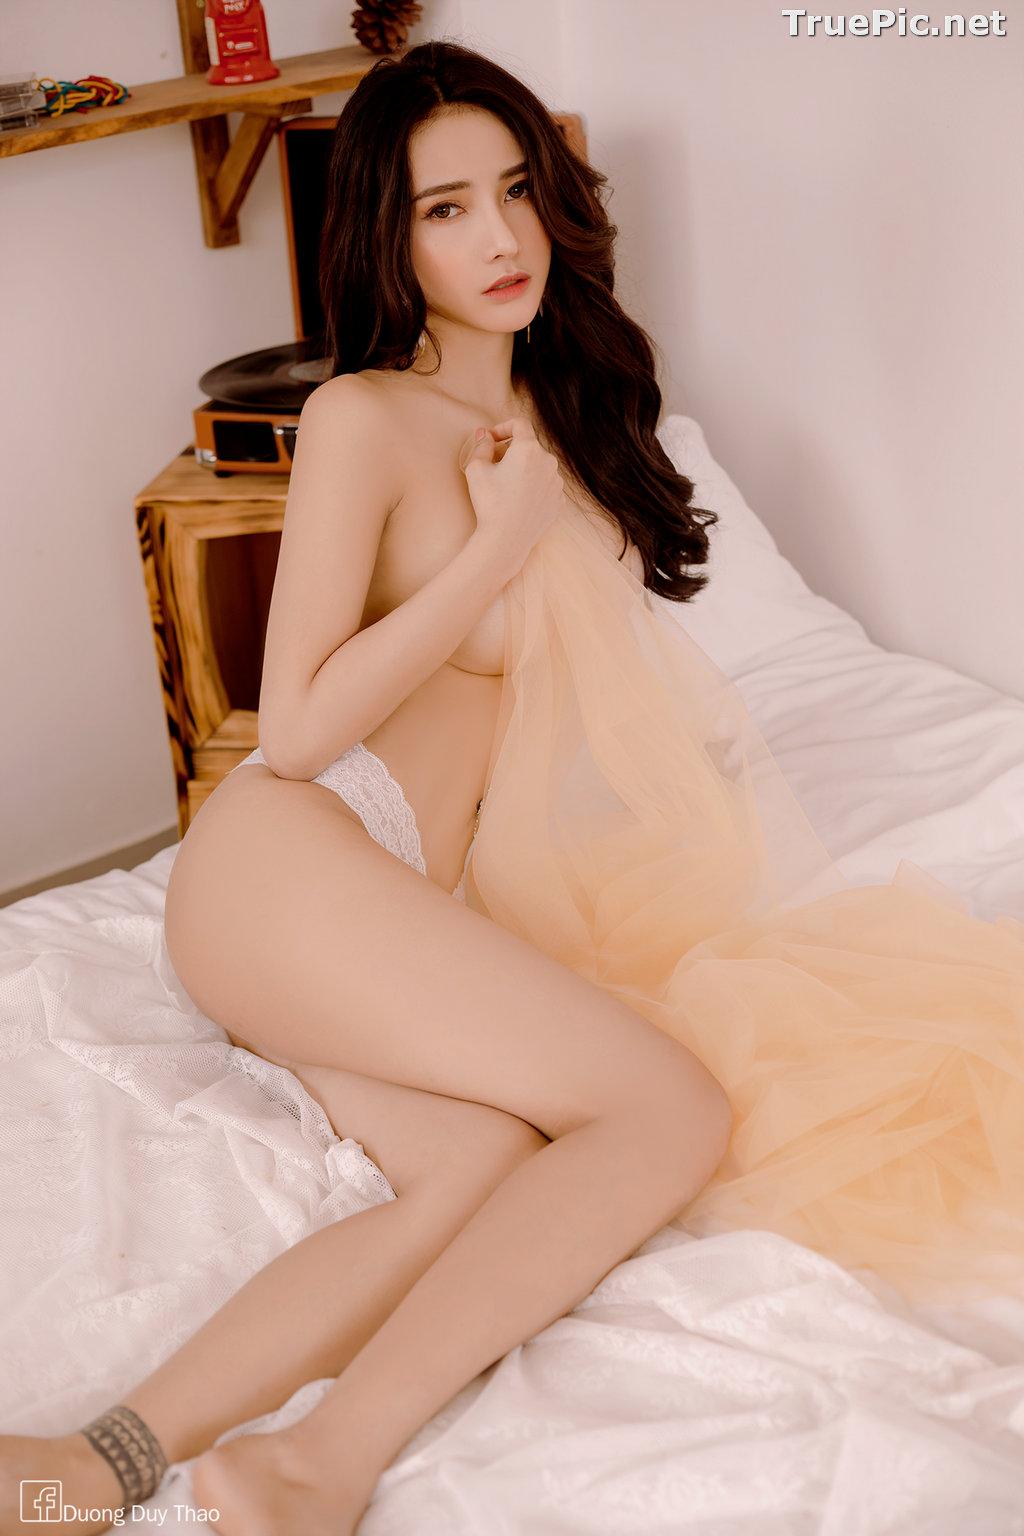 Image Vietnamese Hot Girl – Nguyen Thi Phi Yen - Sexy White Lingerie - TruePic.net - Picture-7